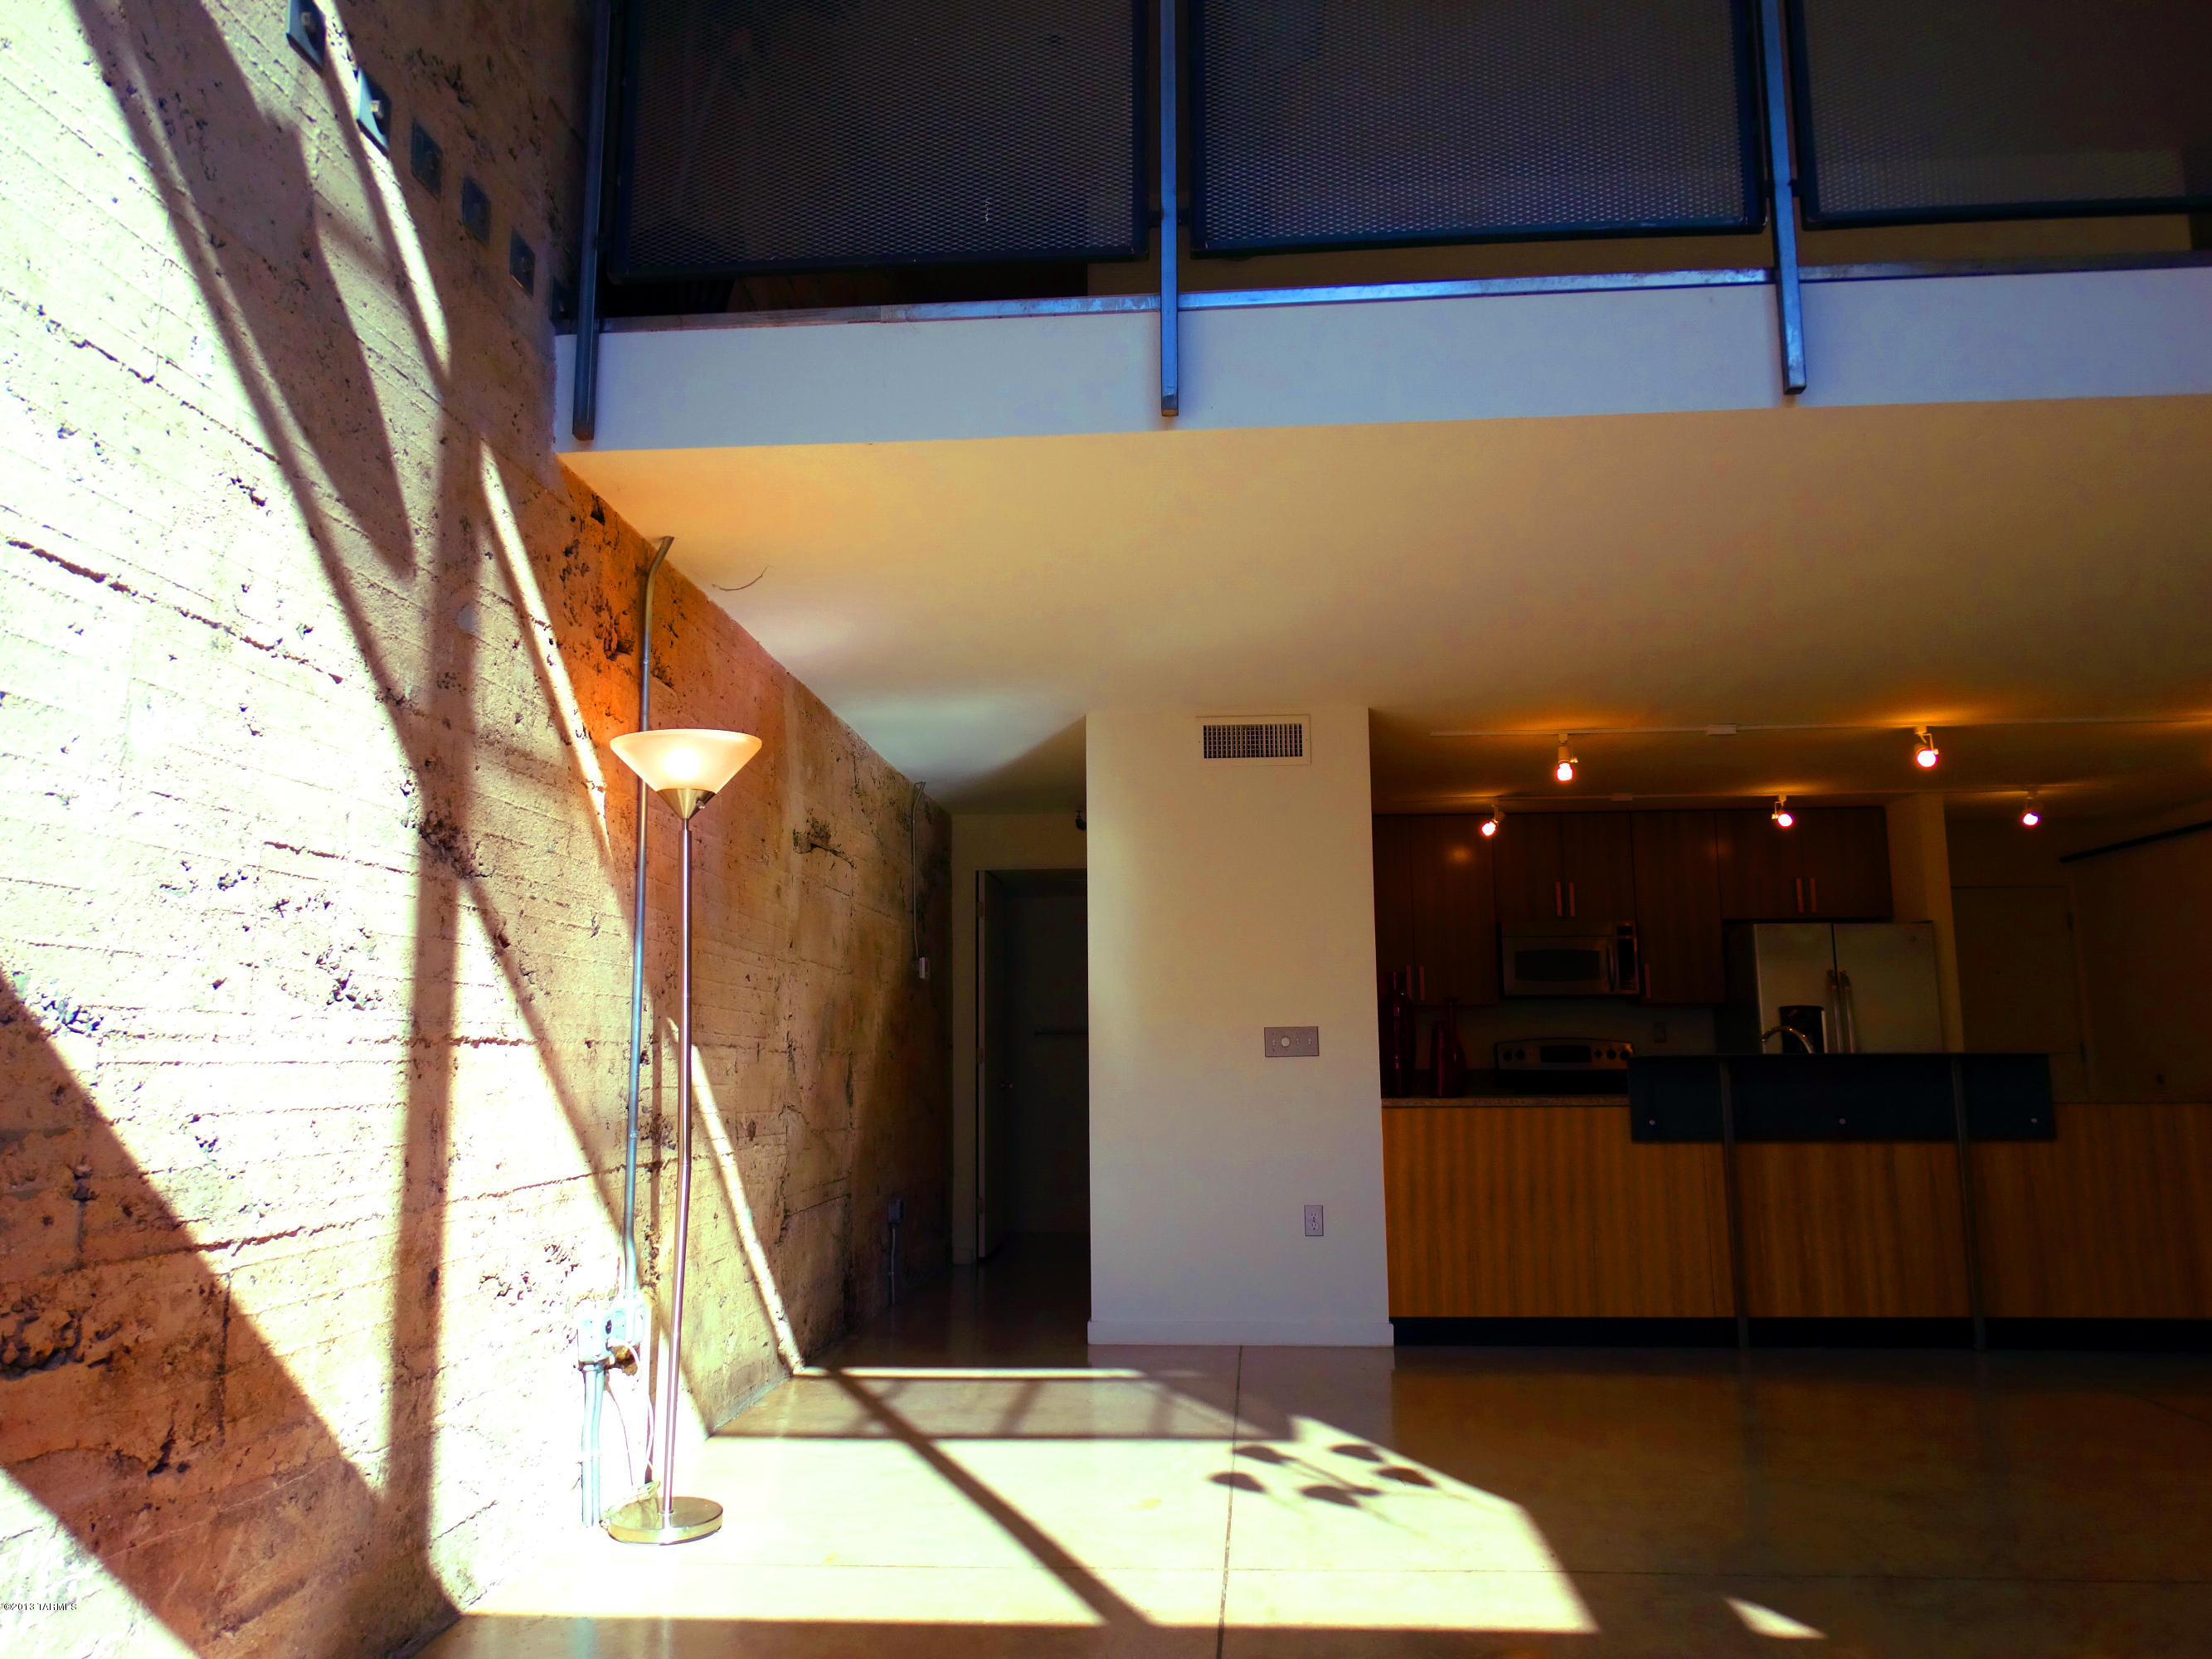 Marvelous Ice House Loft 111 Near Downtown Tucson Az Is For Sale Download Free Architecture Designs Fluibritishbridgeorg